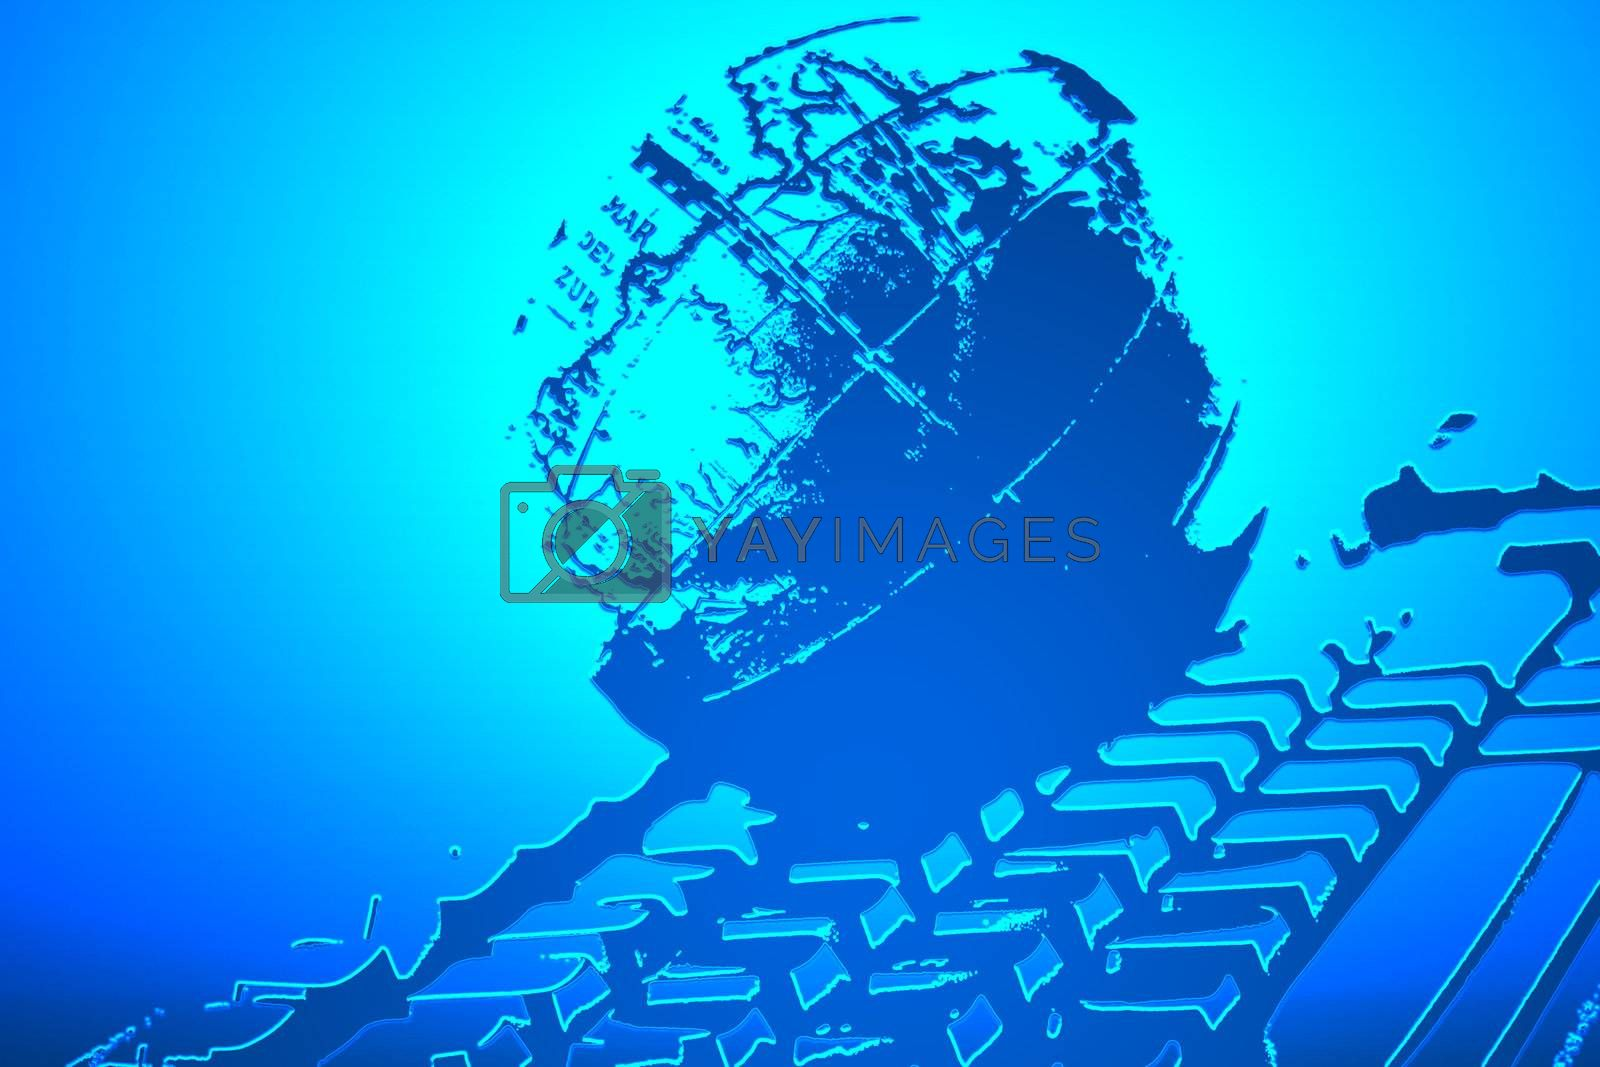 world and keyboard on blue color, illustration